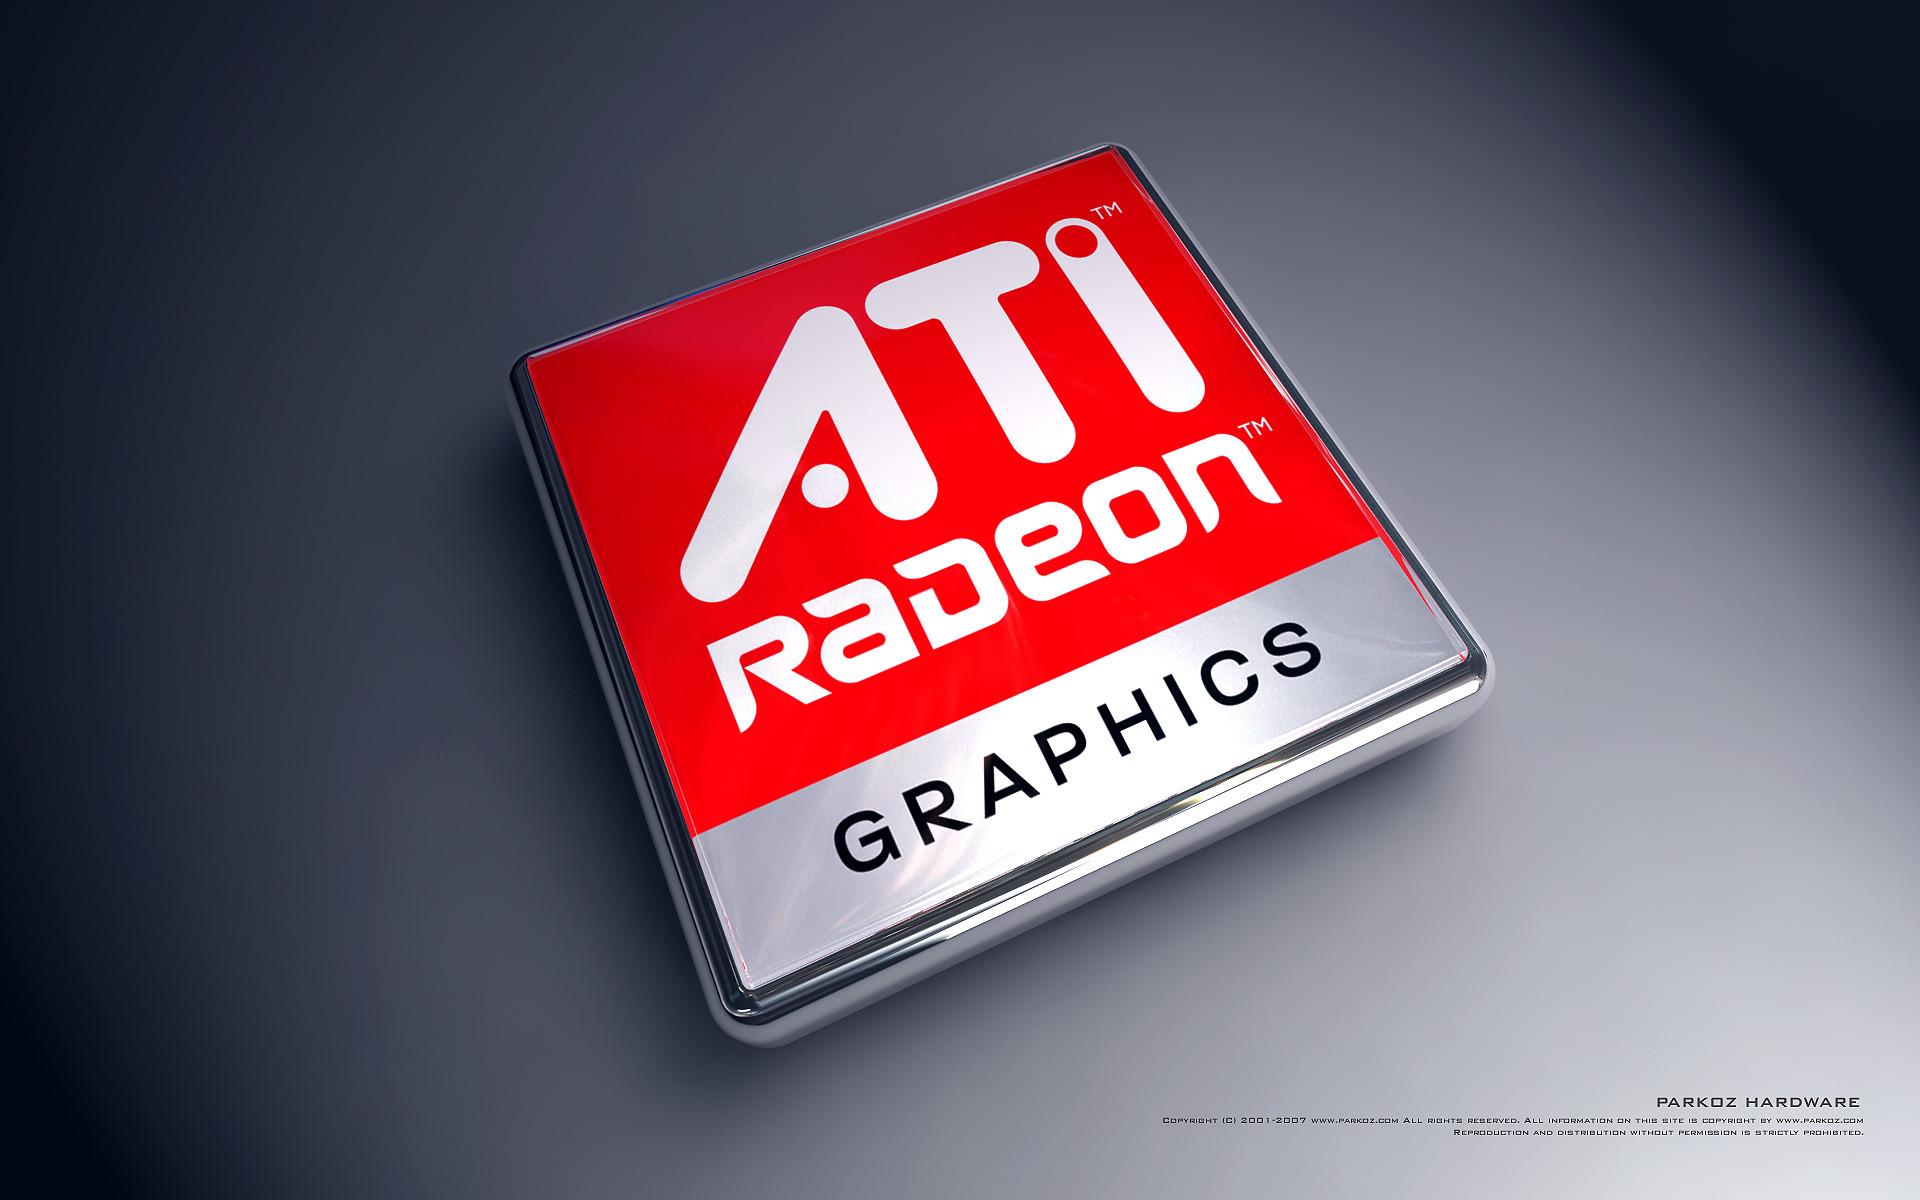 AMD FX Wallpaper – WallpaperSafari · Amd Wallpaper – WallpaperSafari · AMD  Radeon Wallpapers – WallpaperSafari